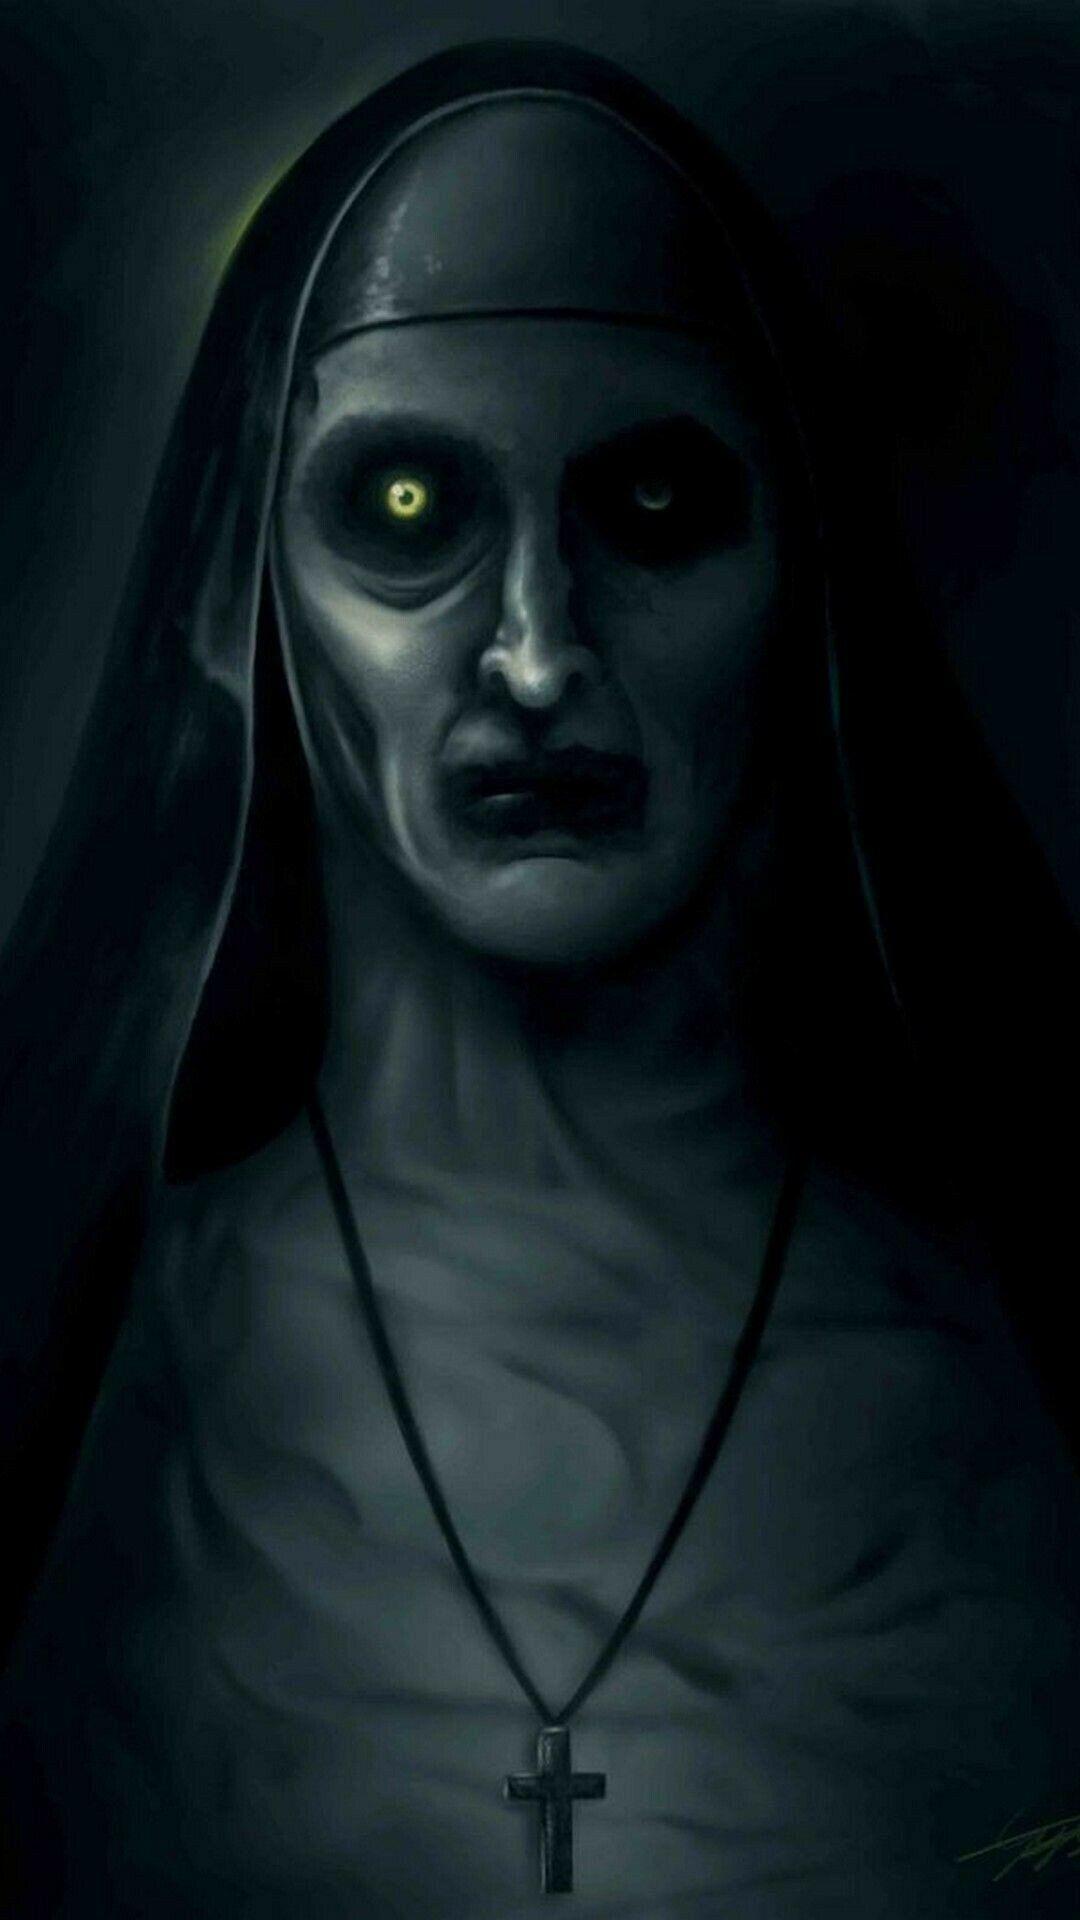 خلفيات رعب Horror مخيف Scary مرعب عالية الوضوح 244 The Conjuring Ghost Movies Film Prints